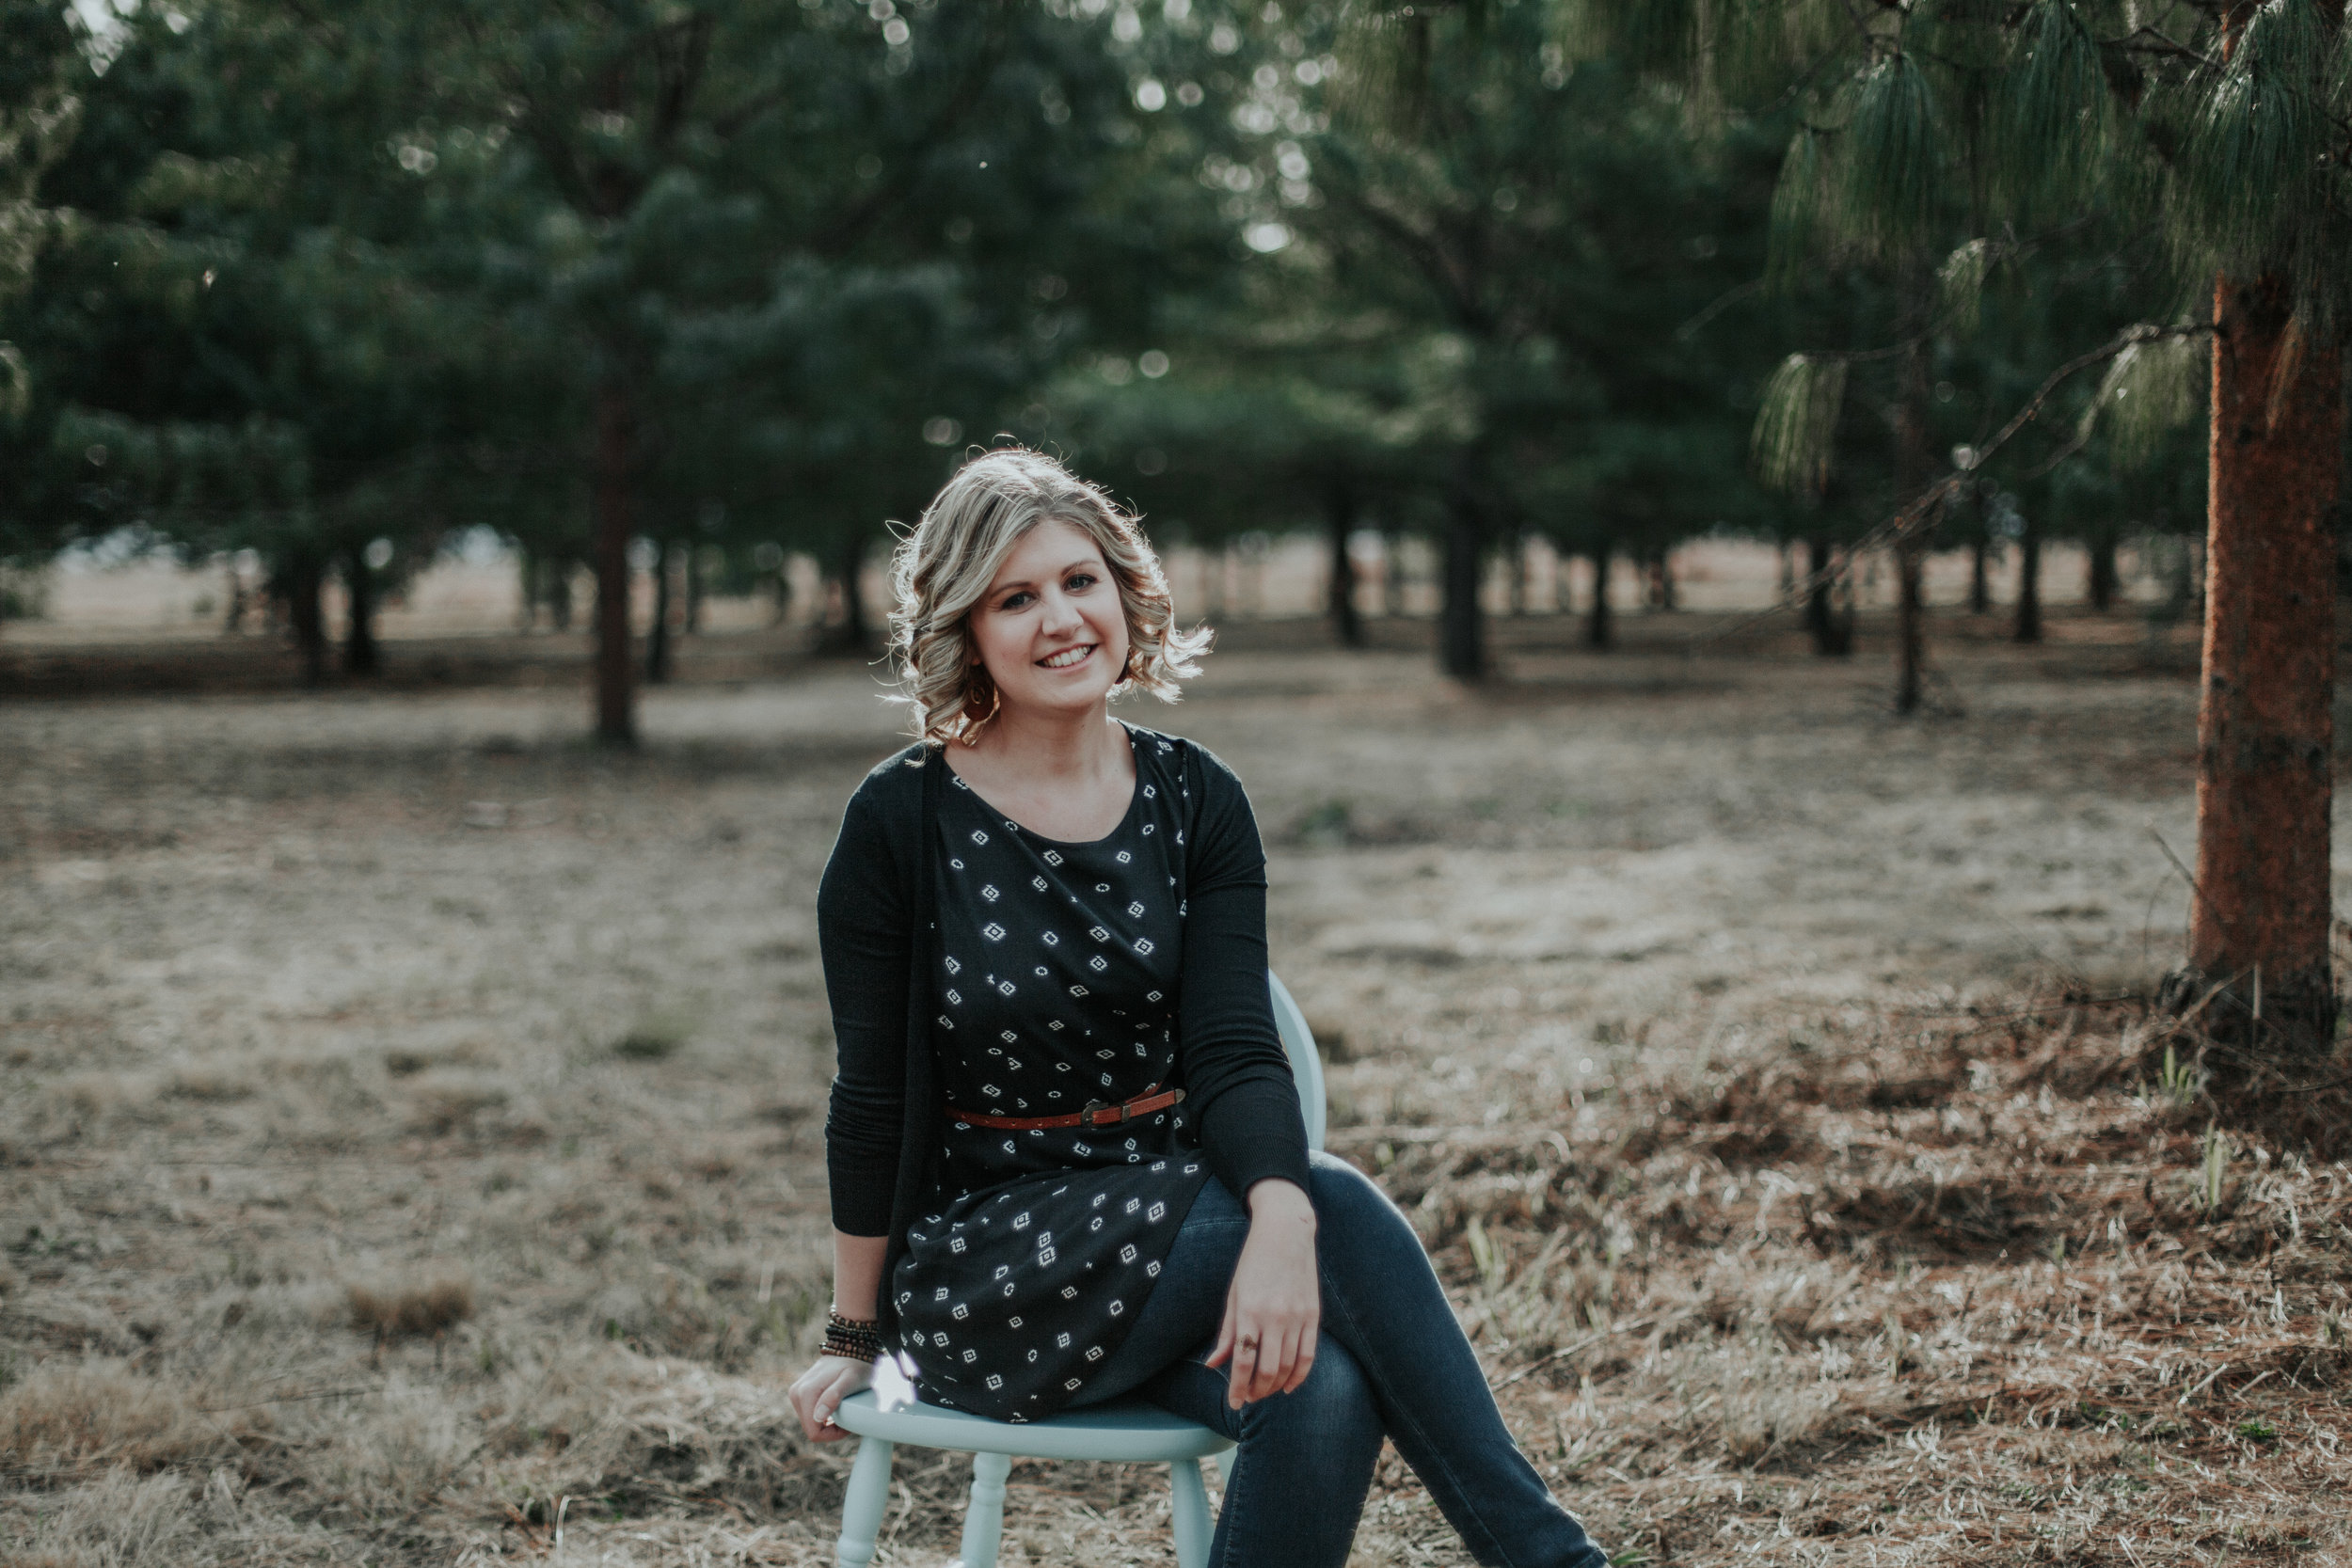 Kristi Smith Photography - Portraits 1.jpg